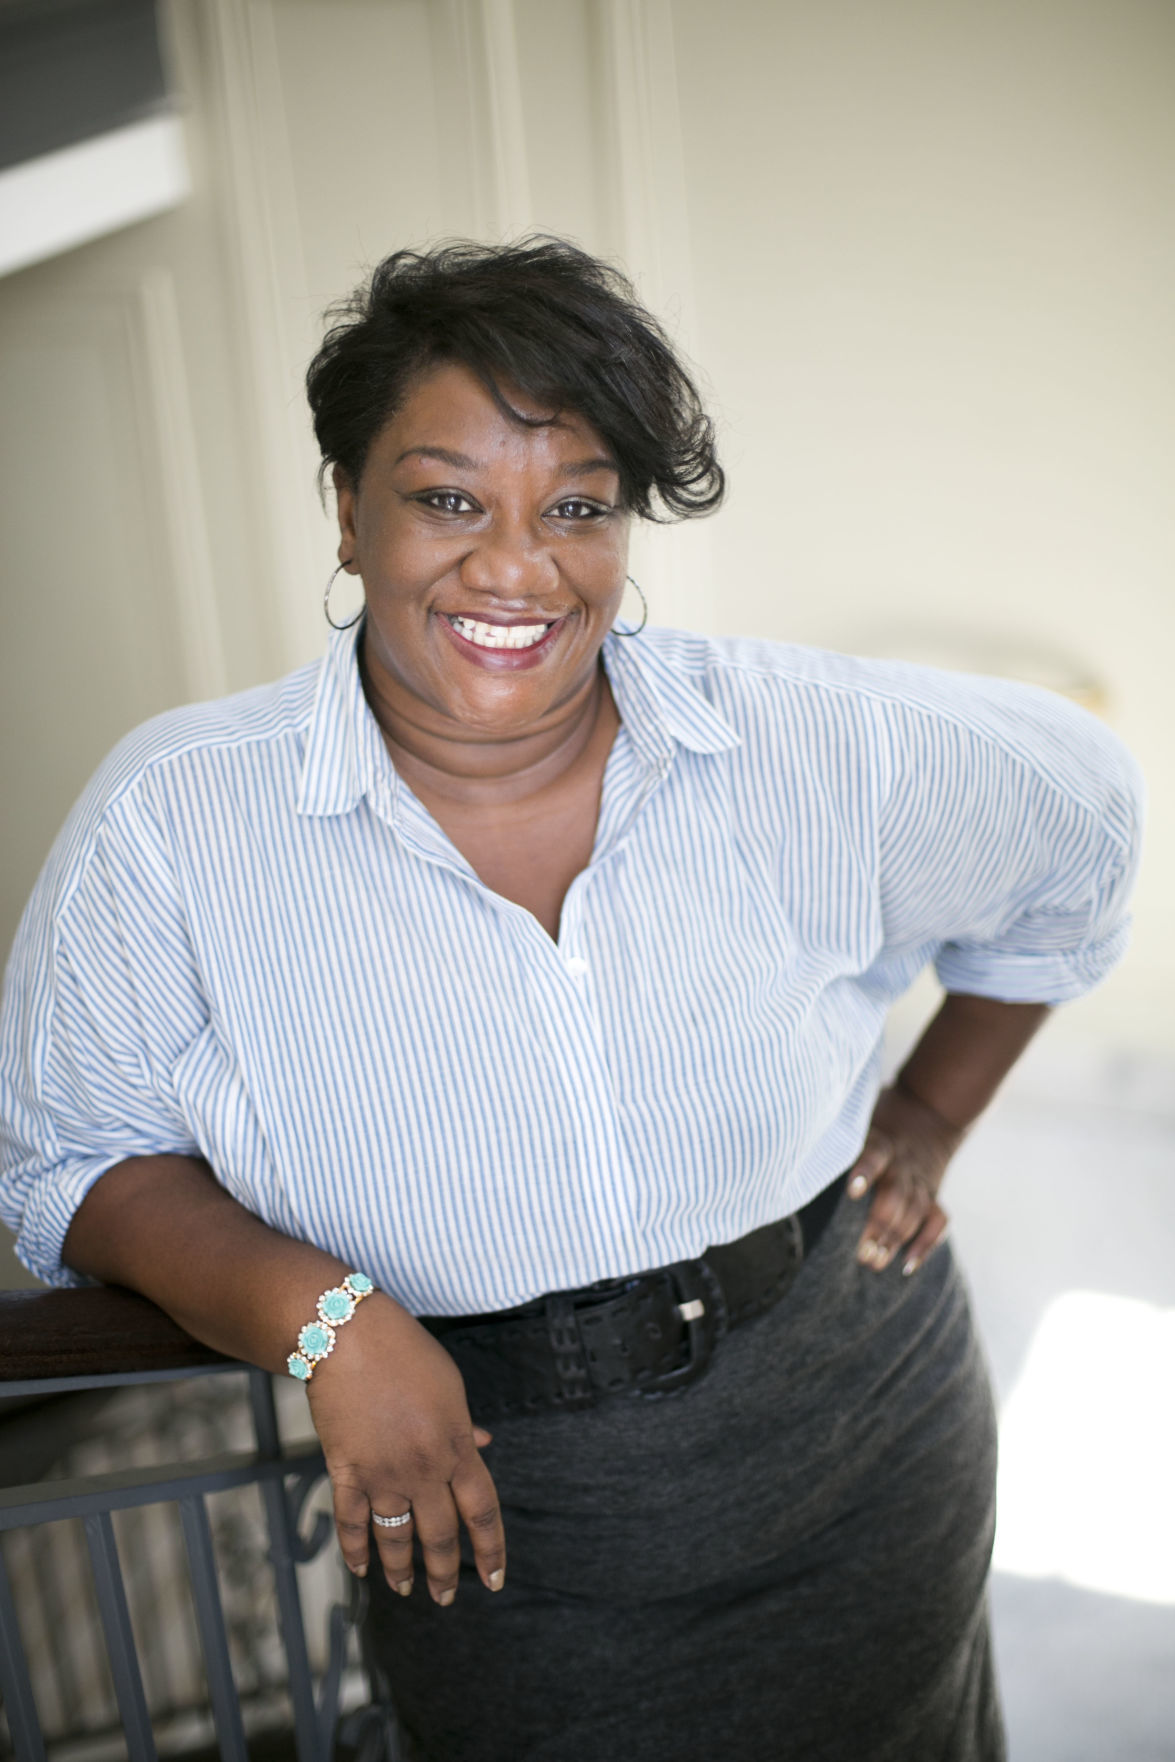 Tressie McMillan Cottom - VCU professor